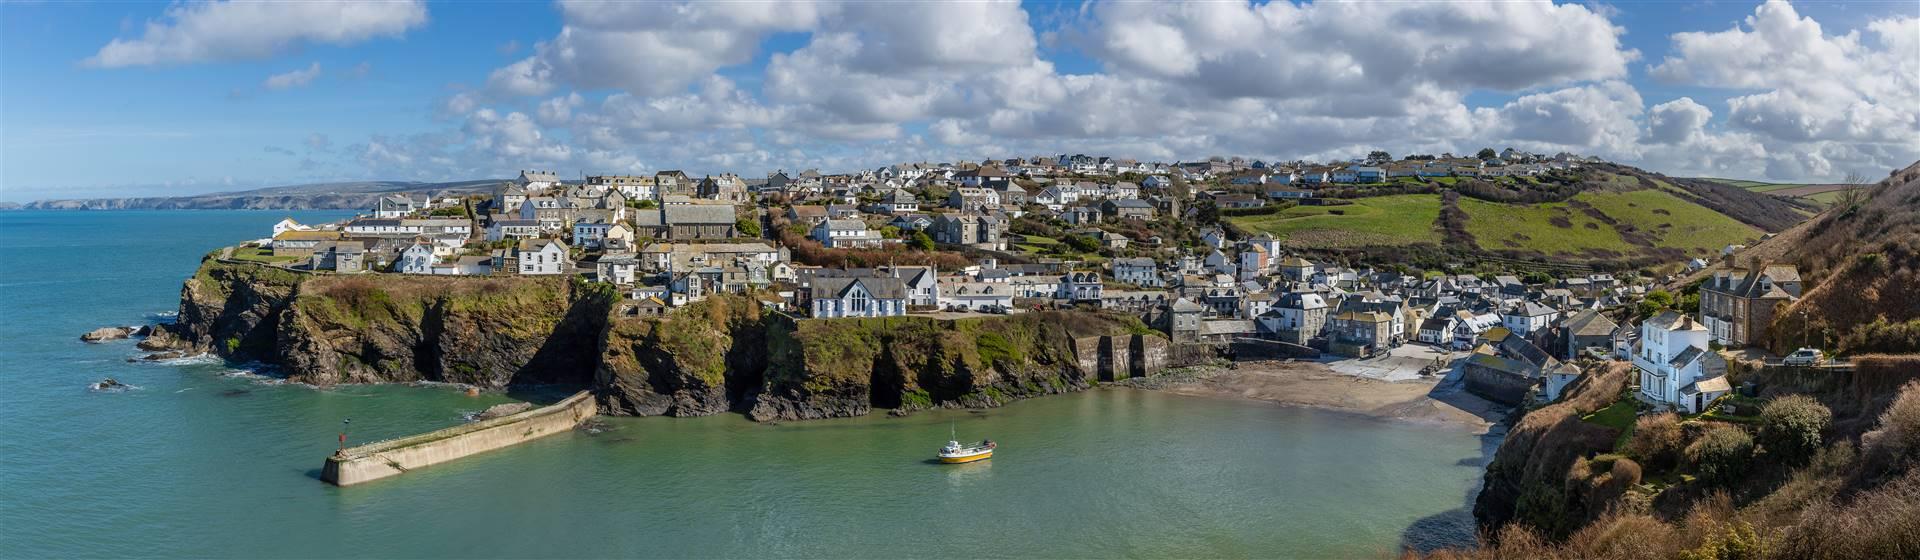 Classic Cornwall - Tintagel, Padstow & Port Issac